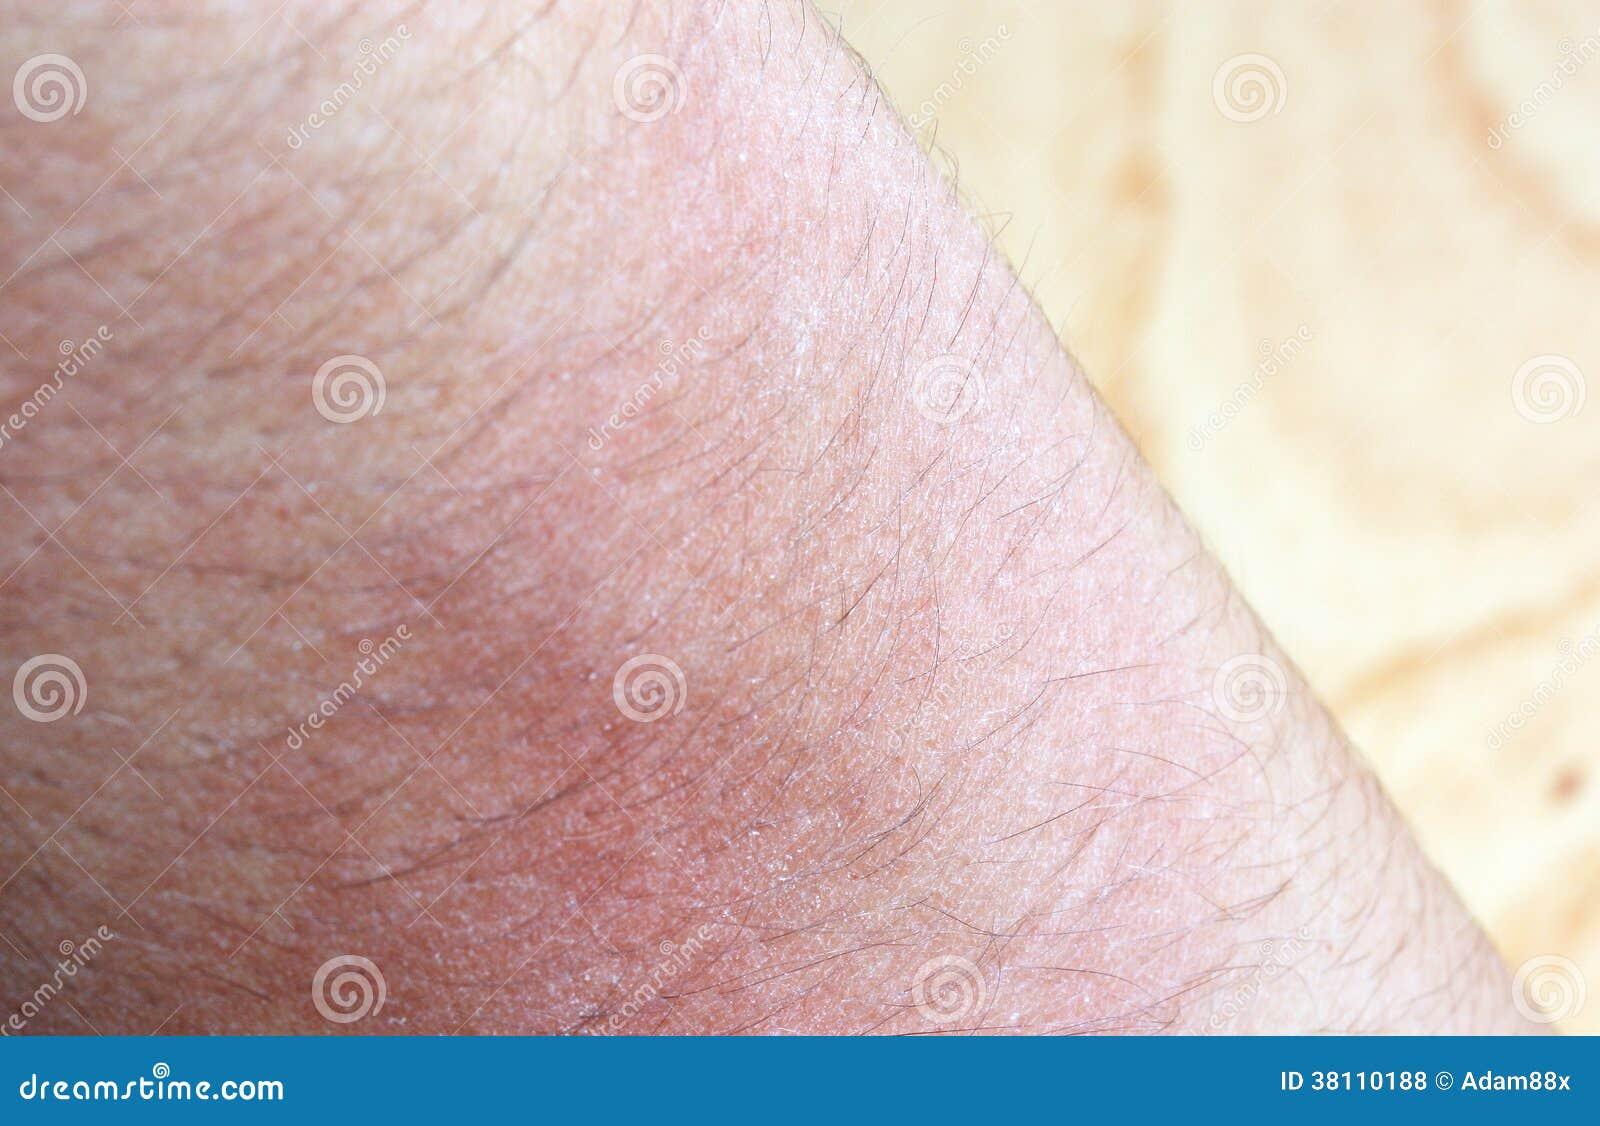 Allergic Rash Dermatitis Eczema Skin Royalty Free Stock Photos - Image ...